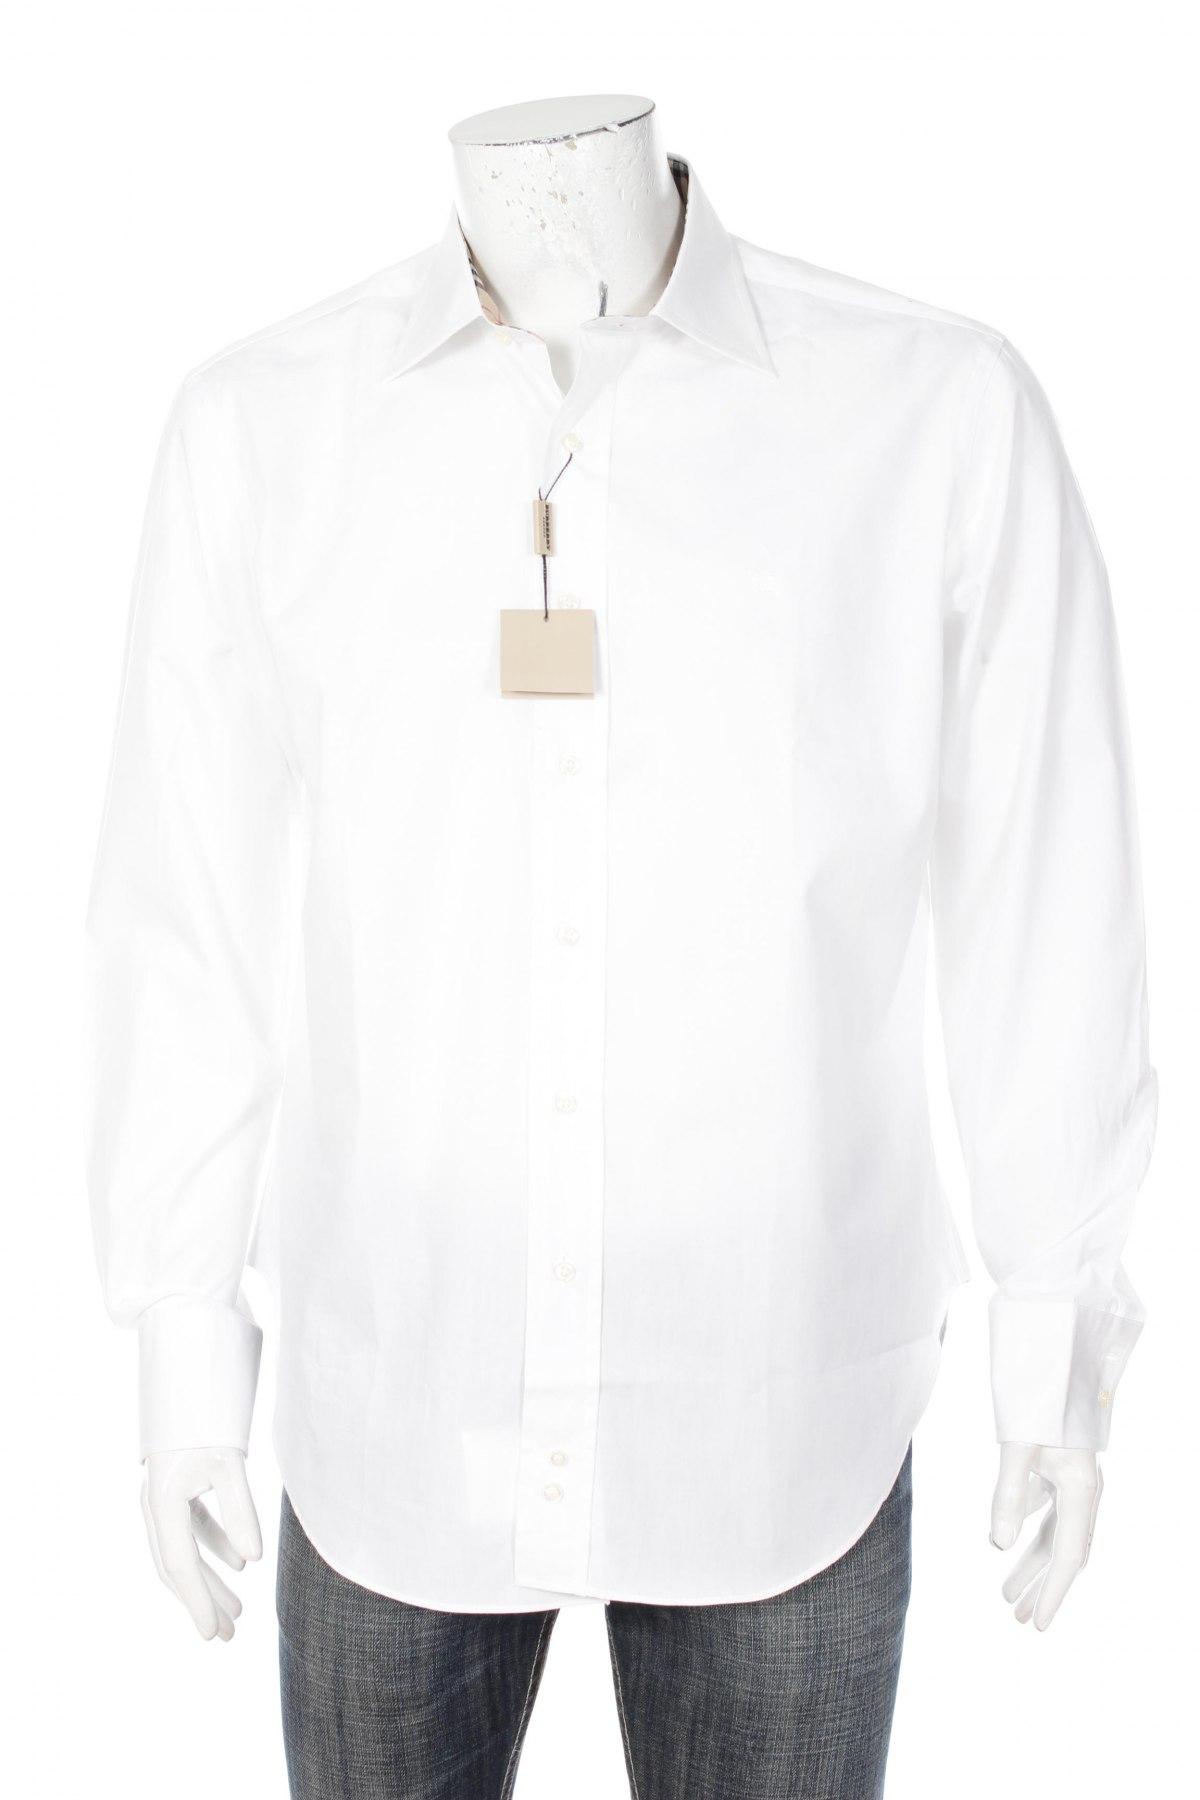 f9b0d14686 Ανδρικό πουκάμισο Burberry - σε συμφέρουσα τιμή στο Remix -  9172743